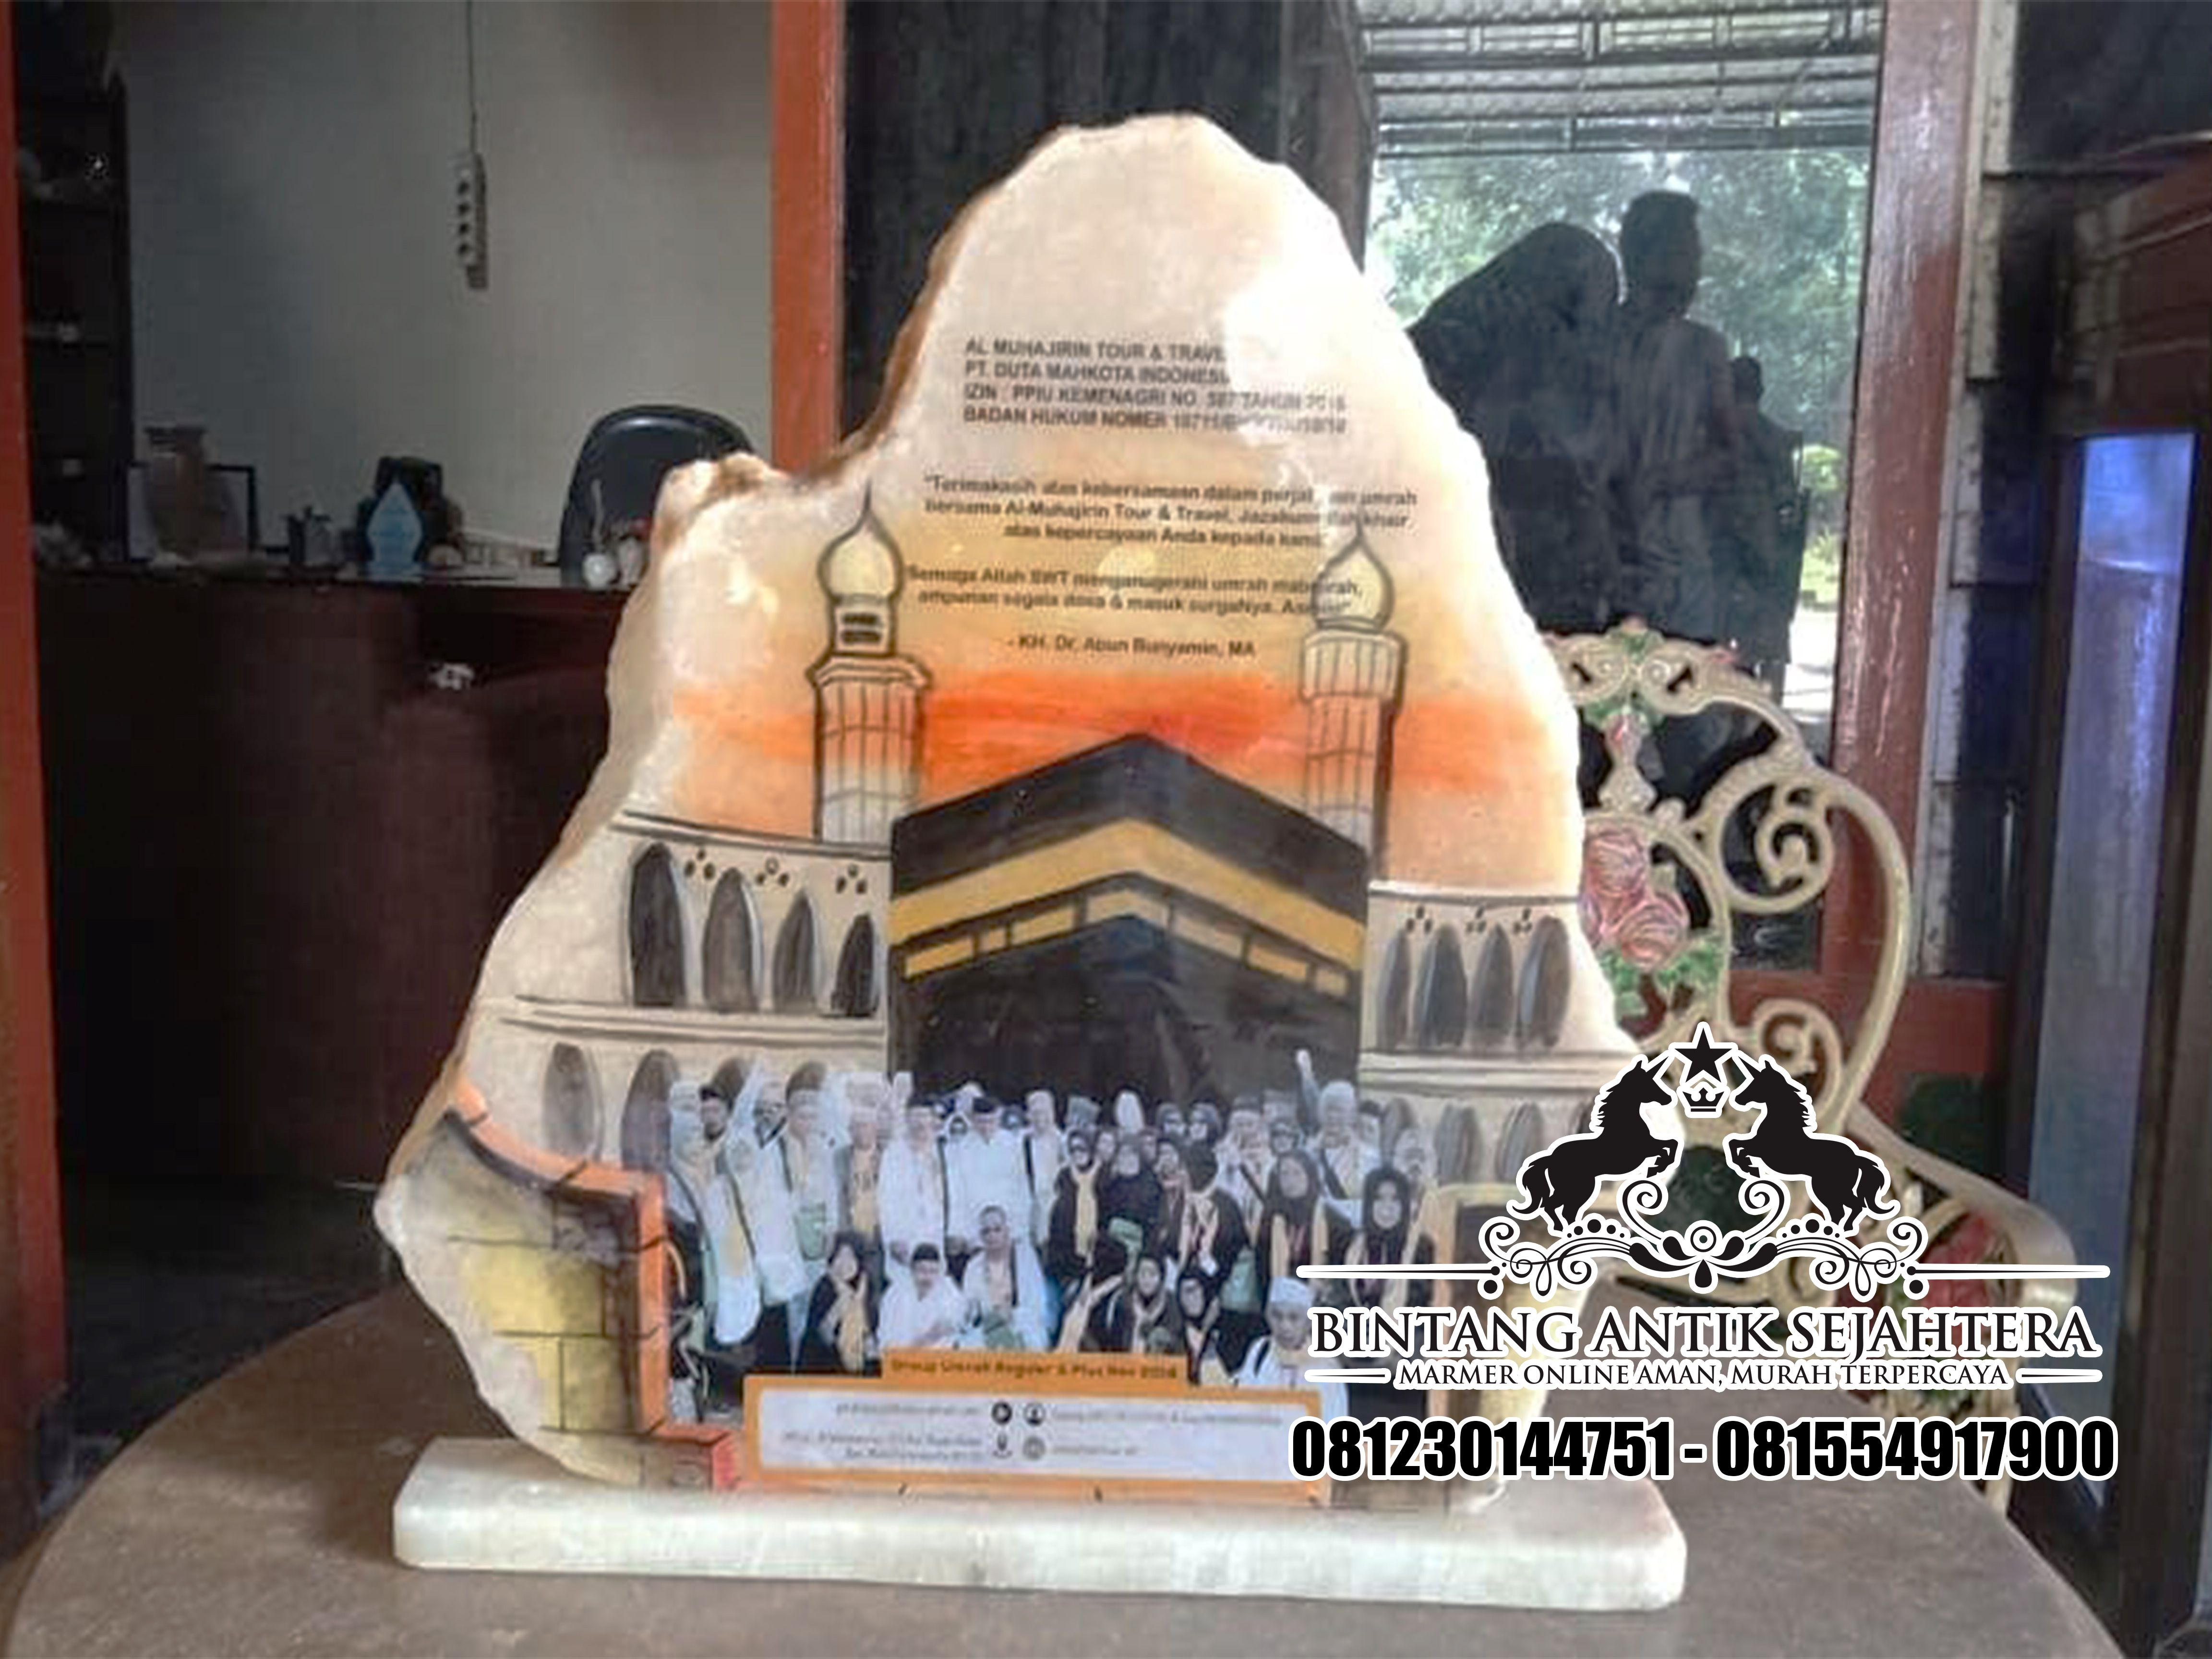 Kerajinan Marmer Tulungagung | Souvenir Marmer | Pernak-Pernik Souvenir Marmer Tulungagung